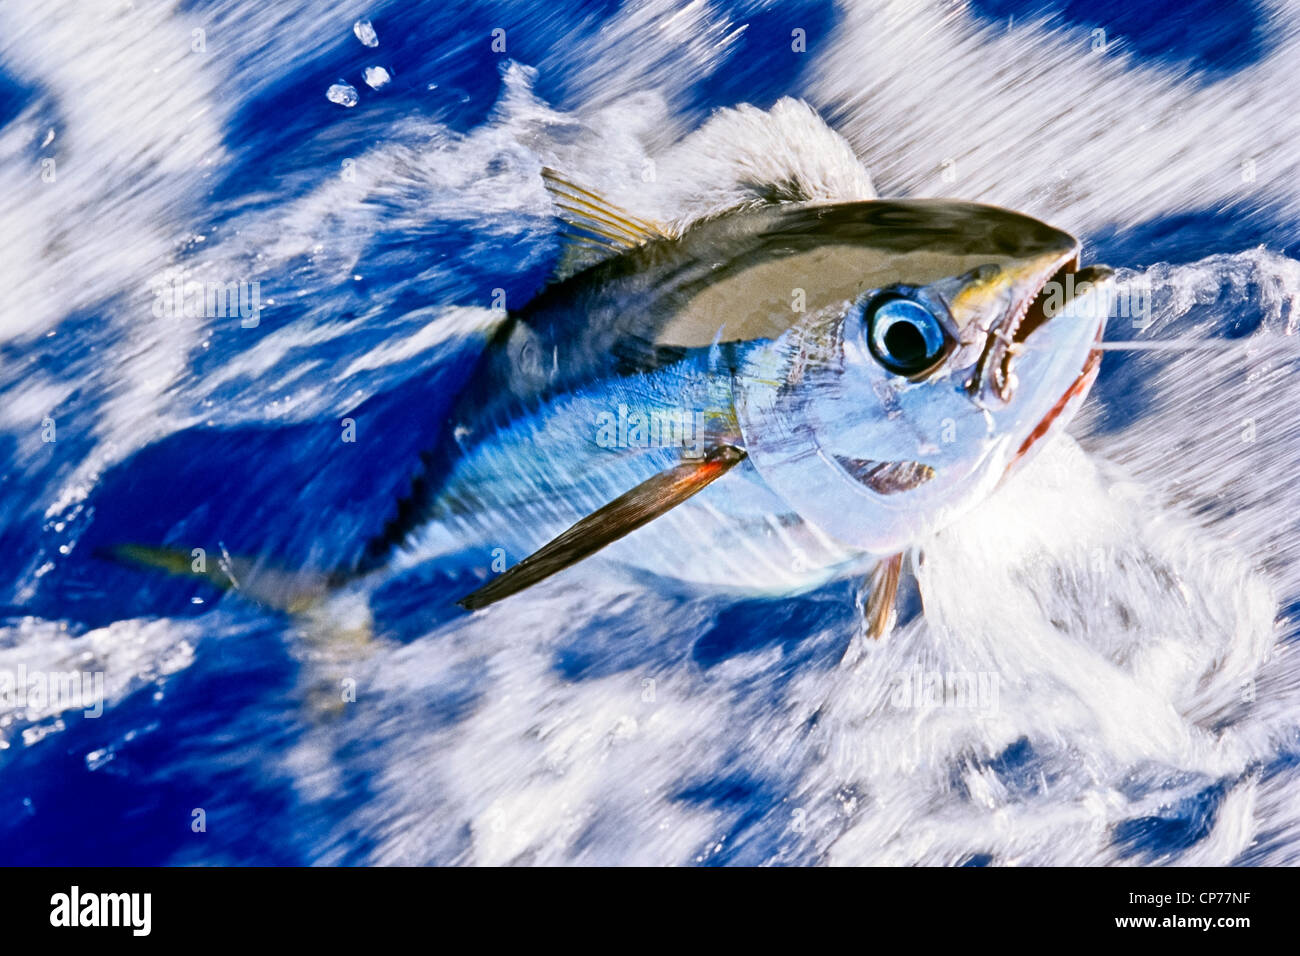 Juvenile Gelbflossenthun auf Linie Stockbild